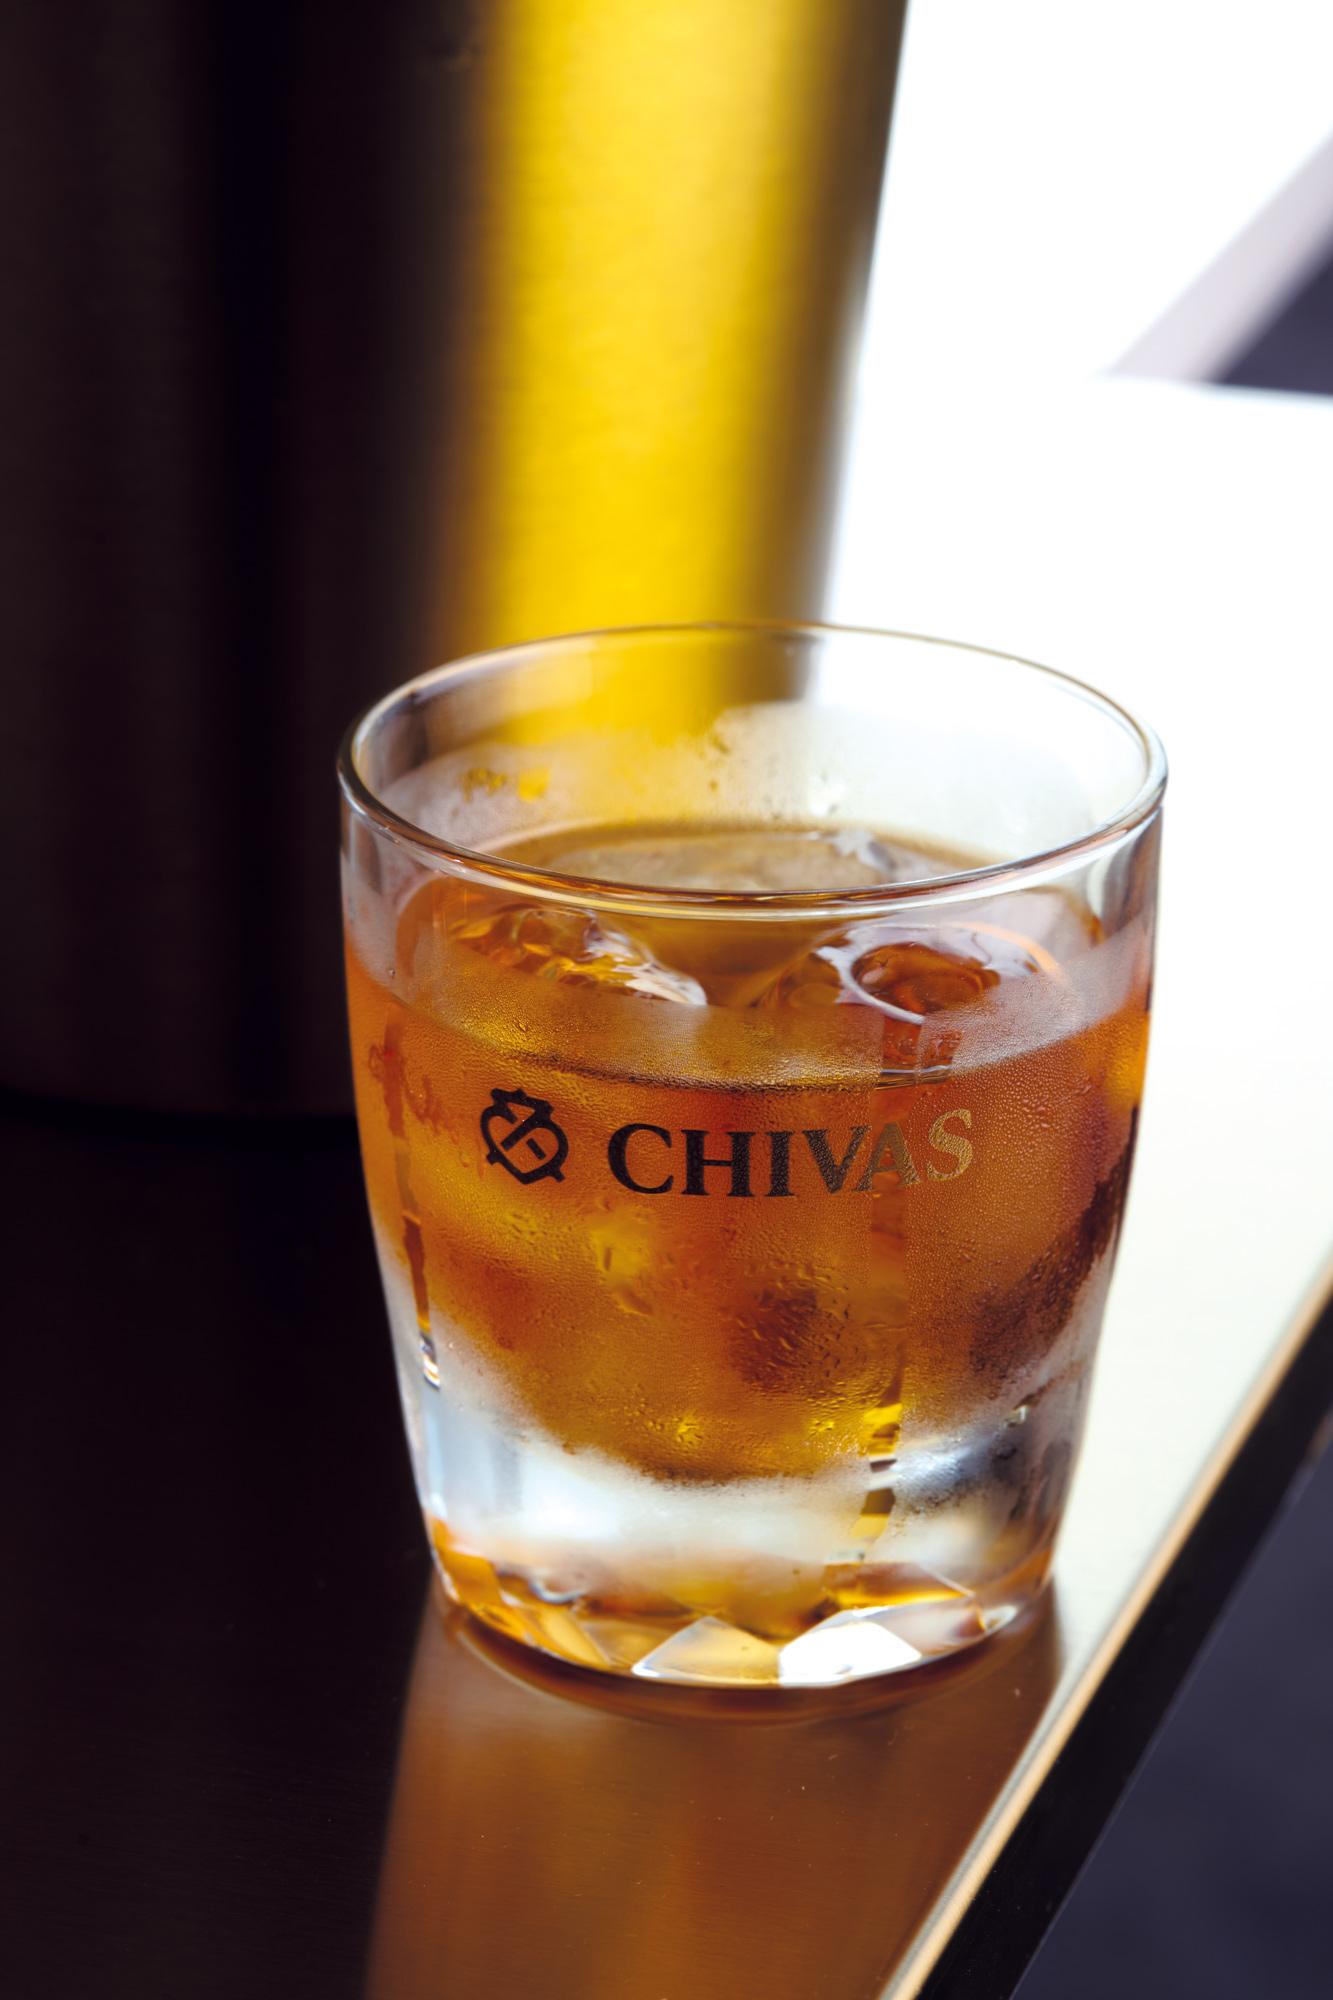 Effortless whisky-based DIY cocktails with Chivas – Part 2